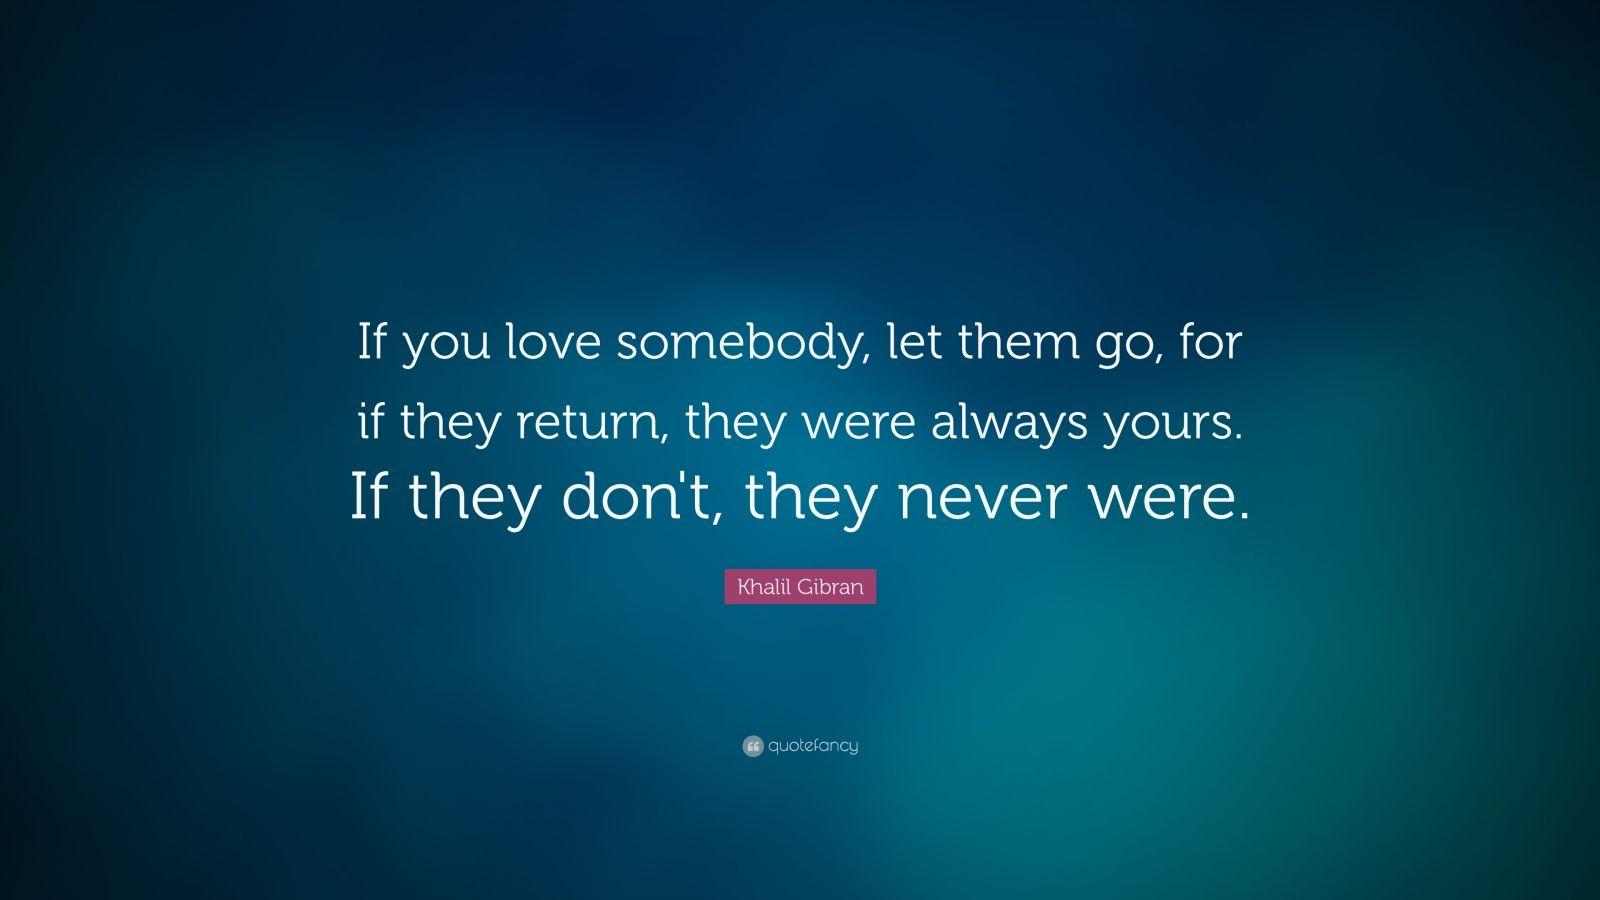 you love somebody let them: